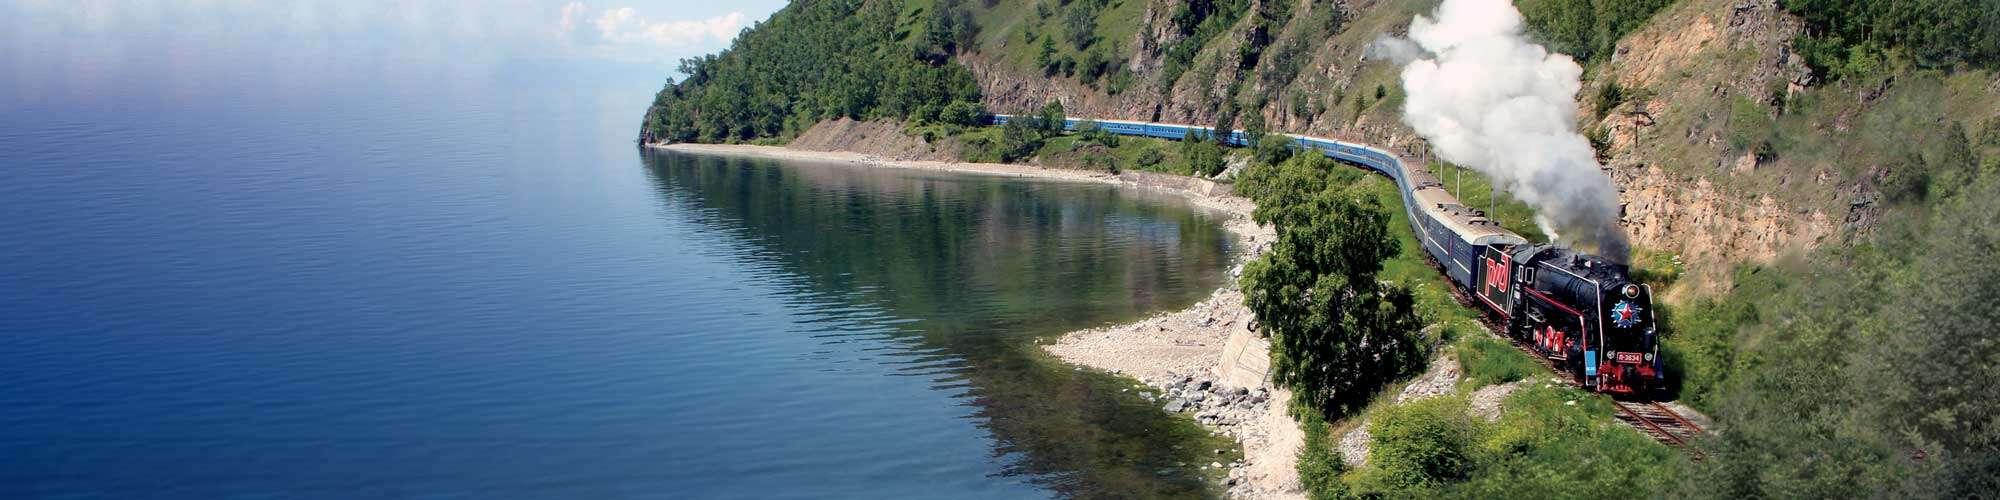 THE GOLDEN EAGLE LUXURY TRAIN- TRANS SIBERIAN EXPRESS